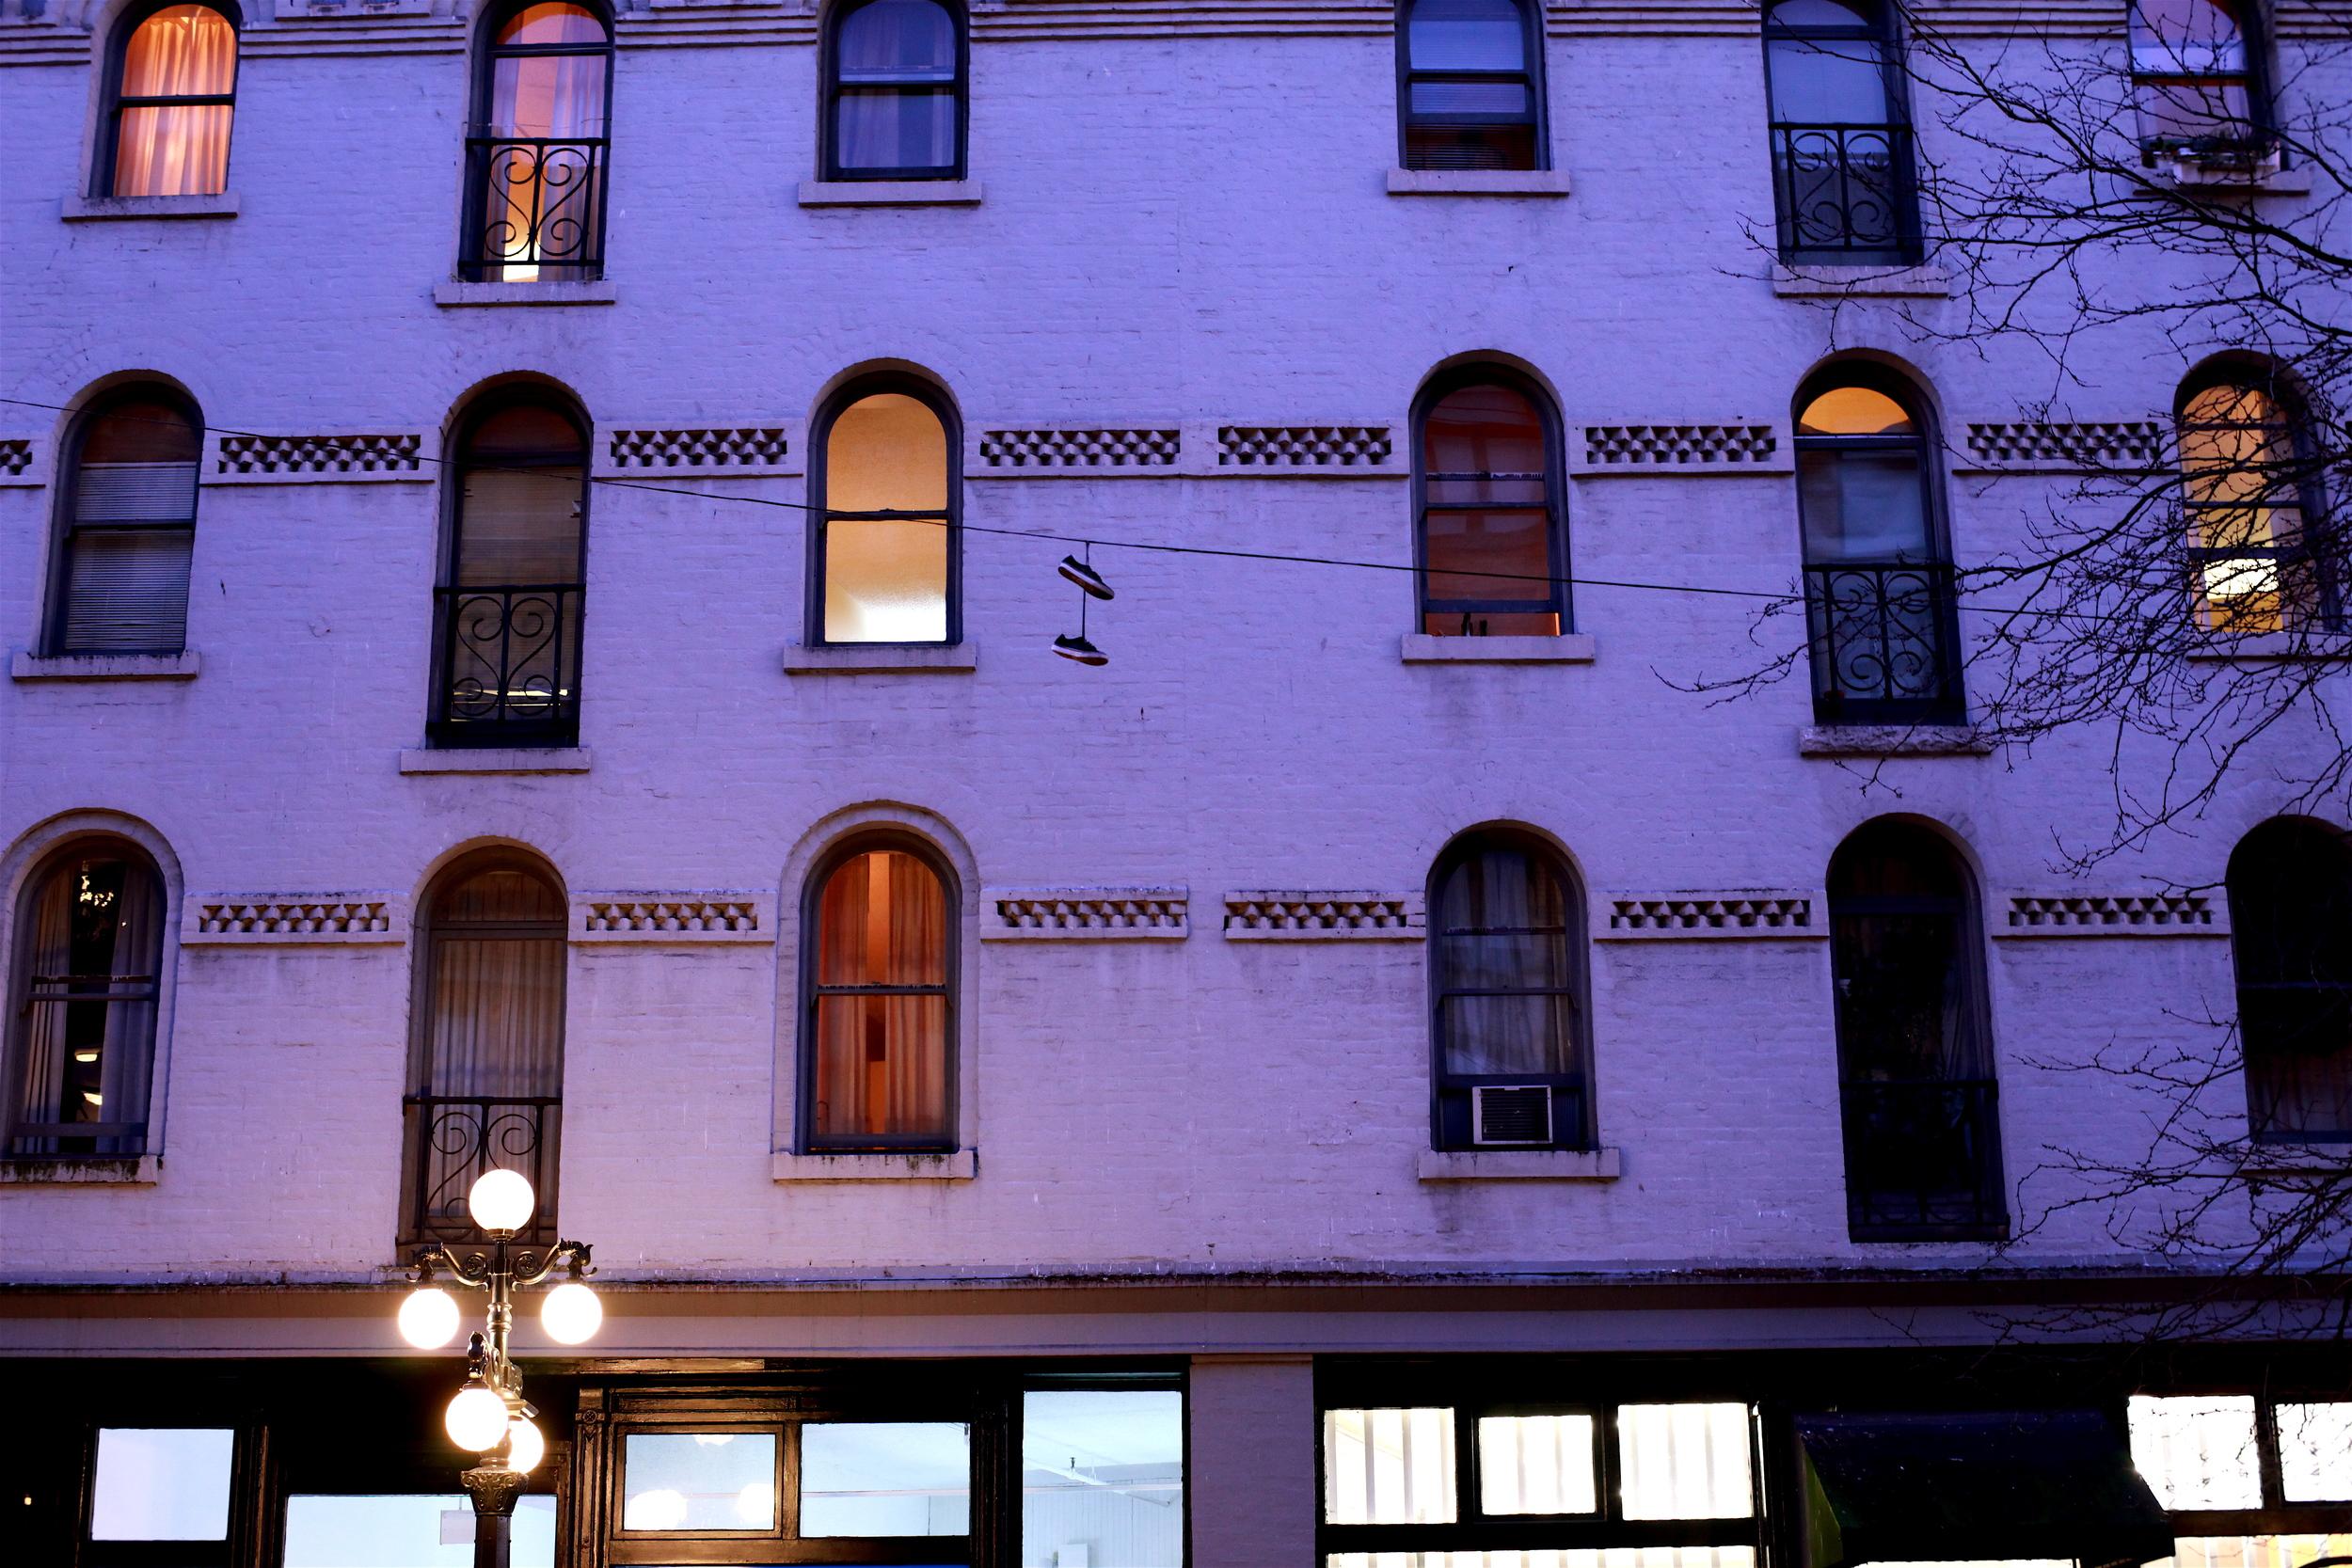 Gastown Heritage Building